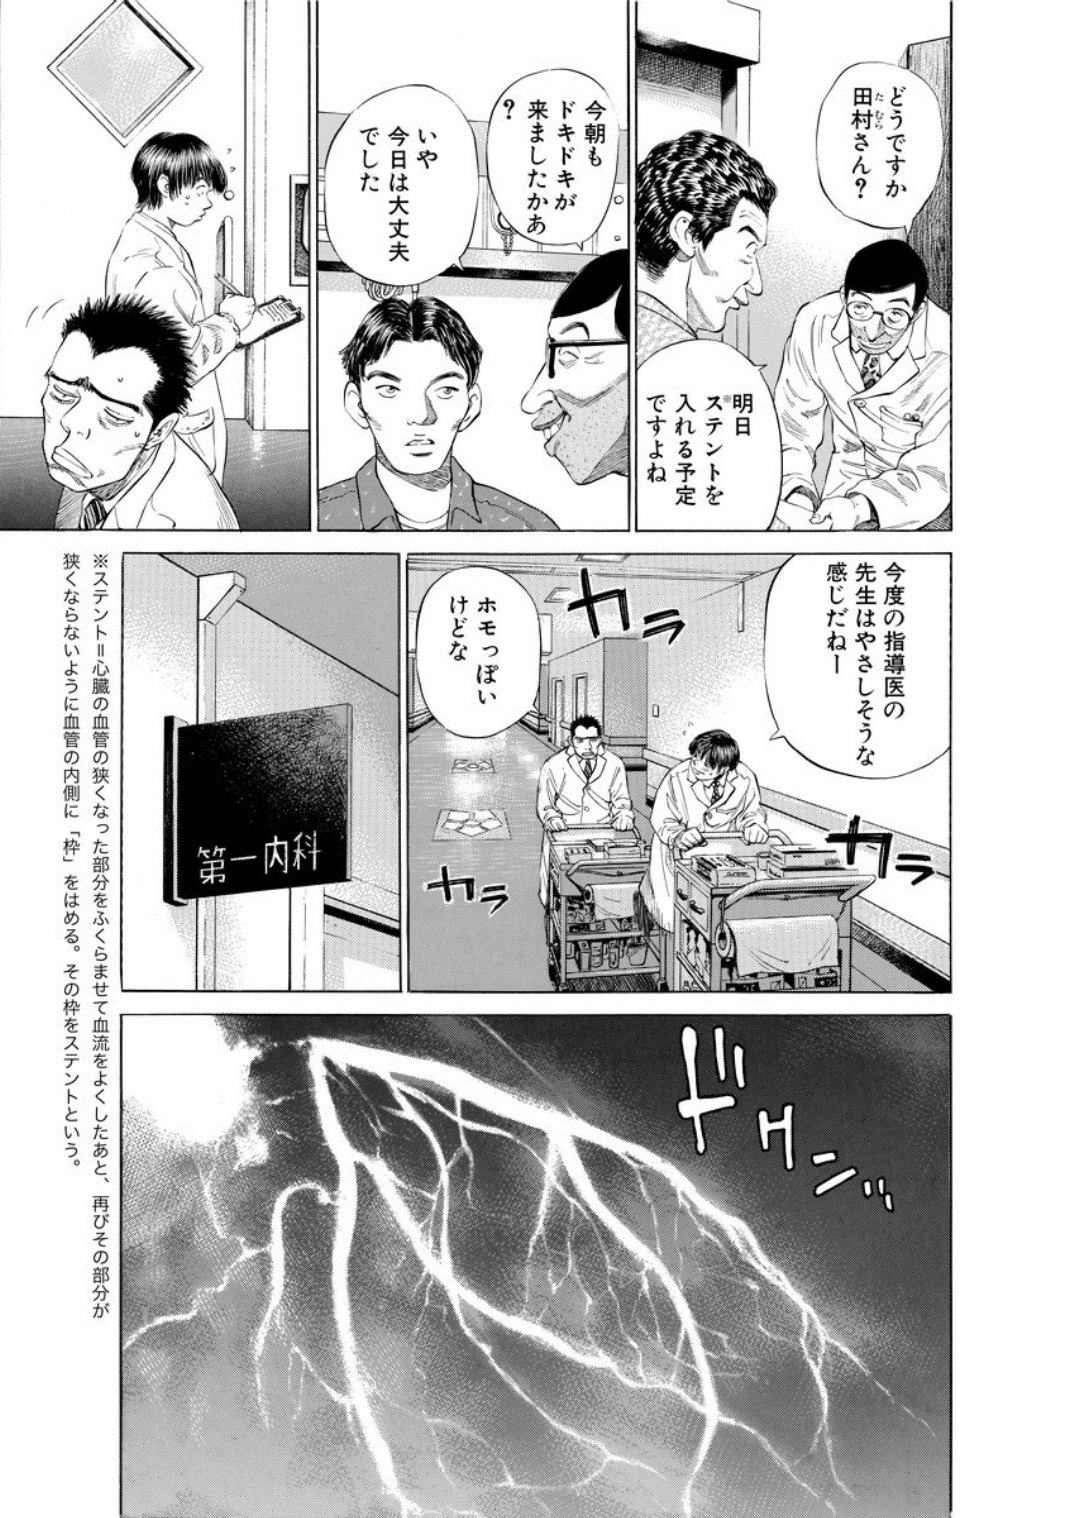 001bj_page-0171.jpg